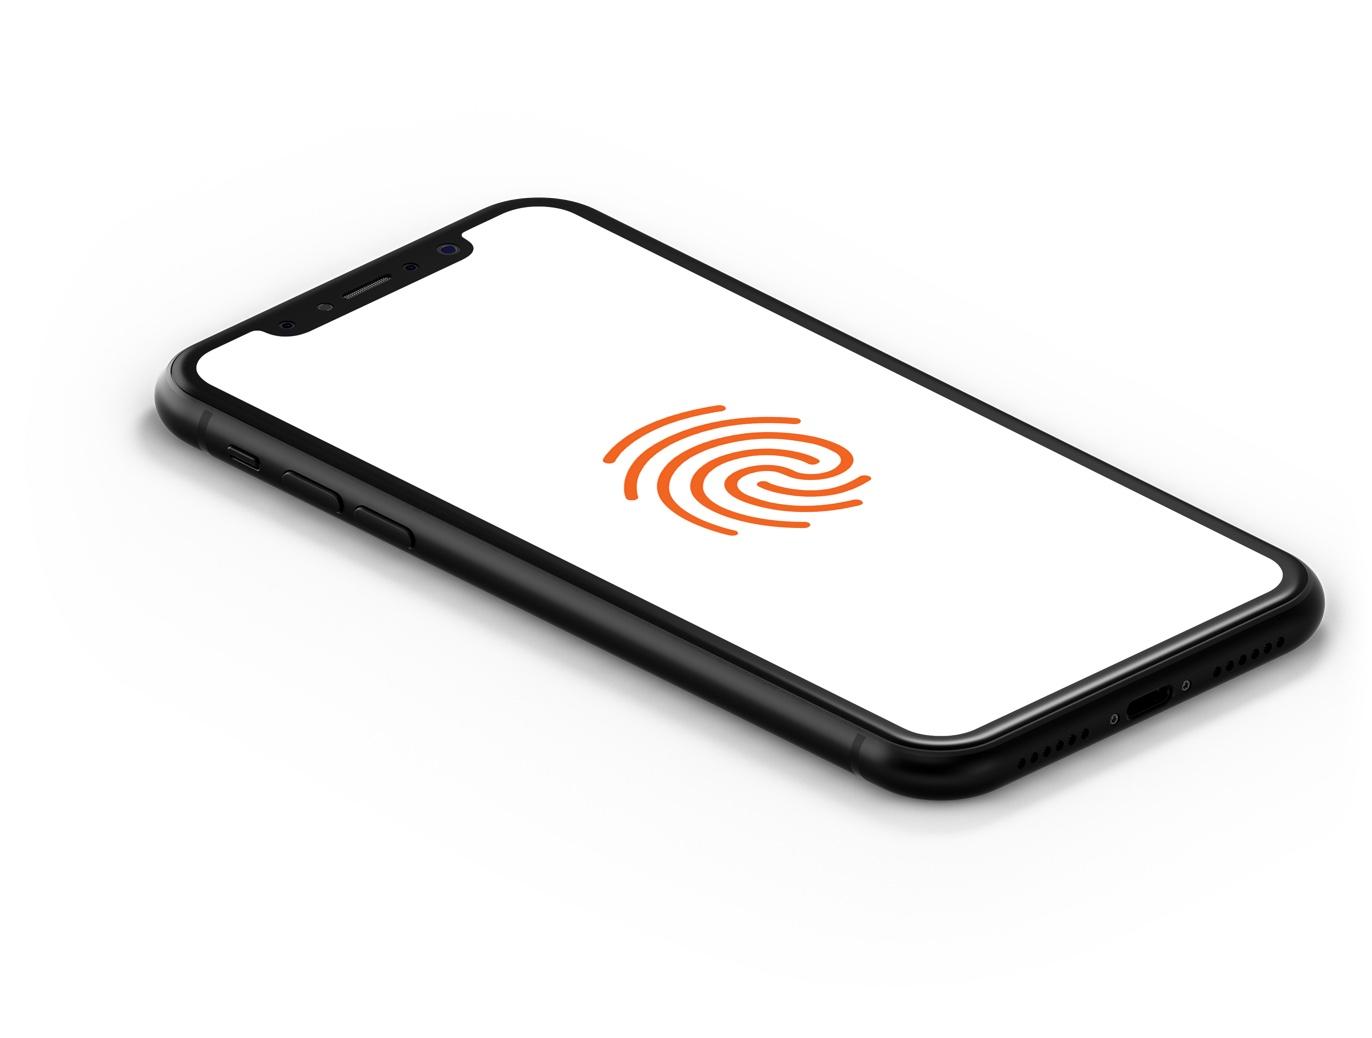 Screenshot of Paga mobile app fingerprint authentication capabilities